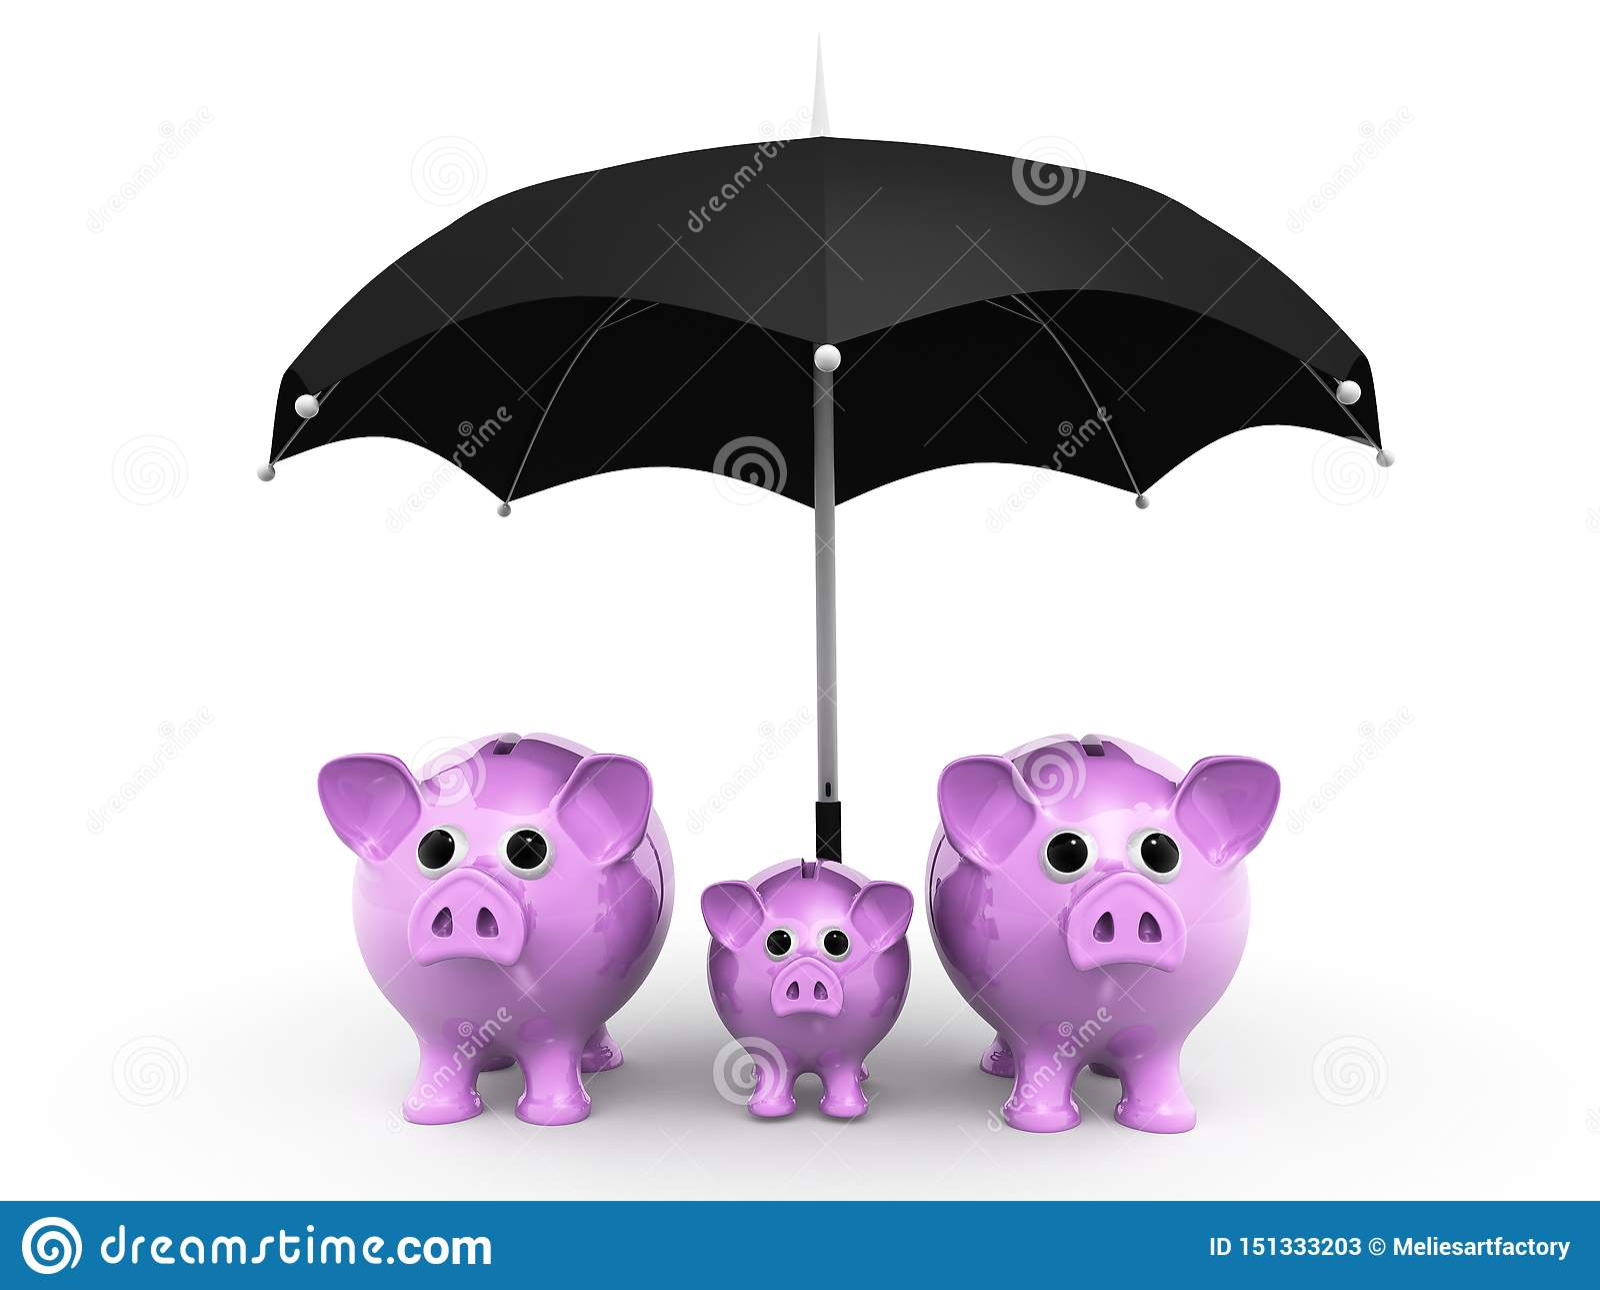 Piggy τράπεζα με το Λα umber, ασφαλιστική προστασία στις επενδύσεις σας, piggy τράπεζα με το Λα umber, ασφάλεια επένδυσης, χρήματ